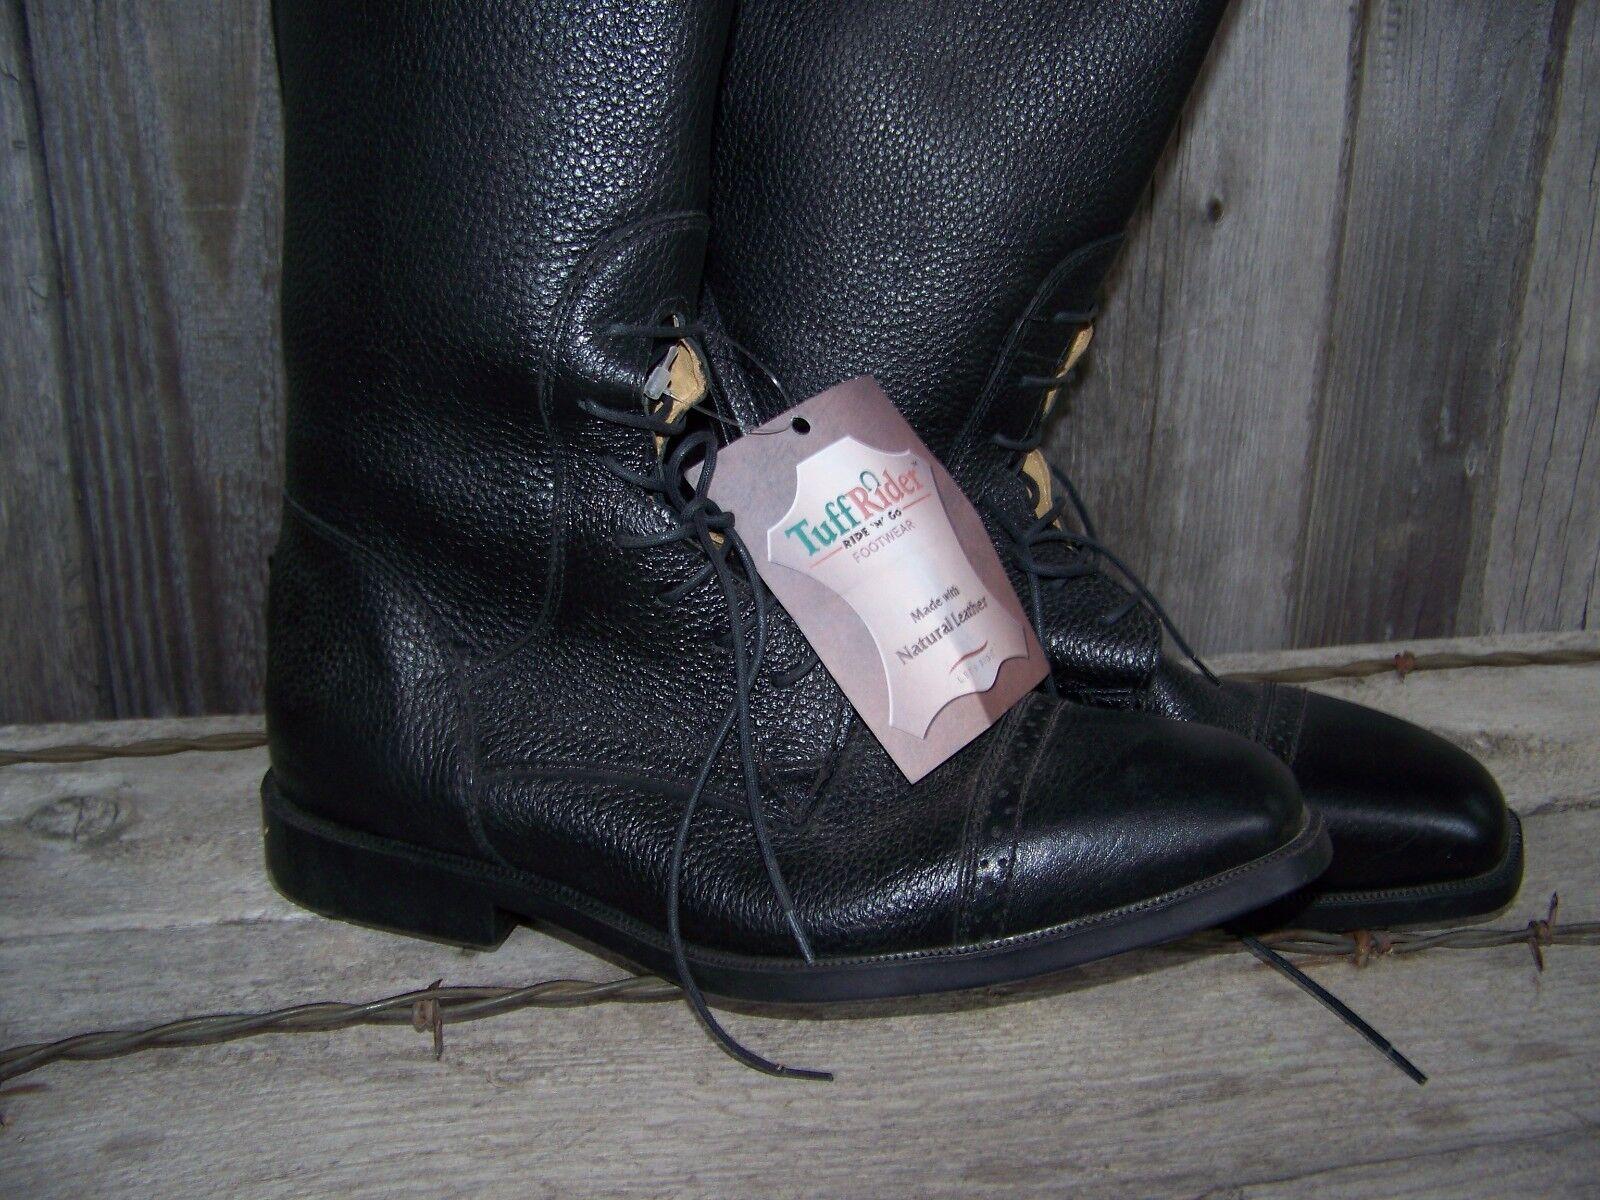 Field Stiefel (Pebbled Grain) with Slide Slide with Zip - TuffRider for Damens (Größe 11.0S) 707b4a